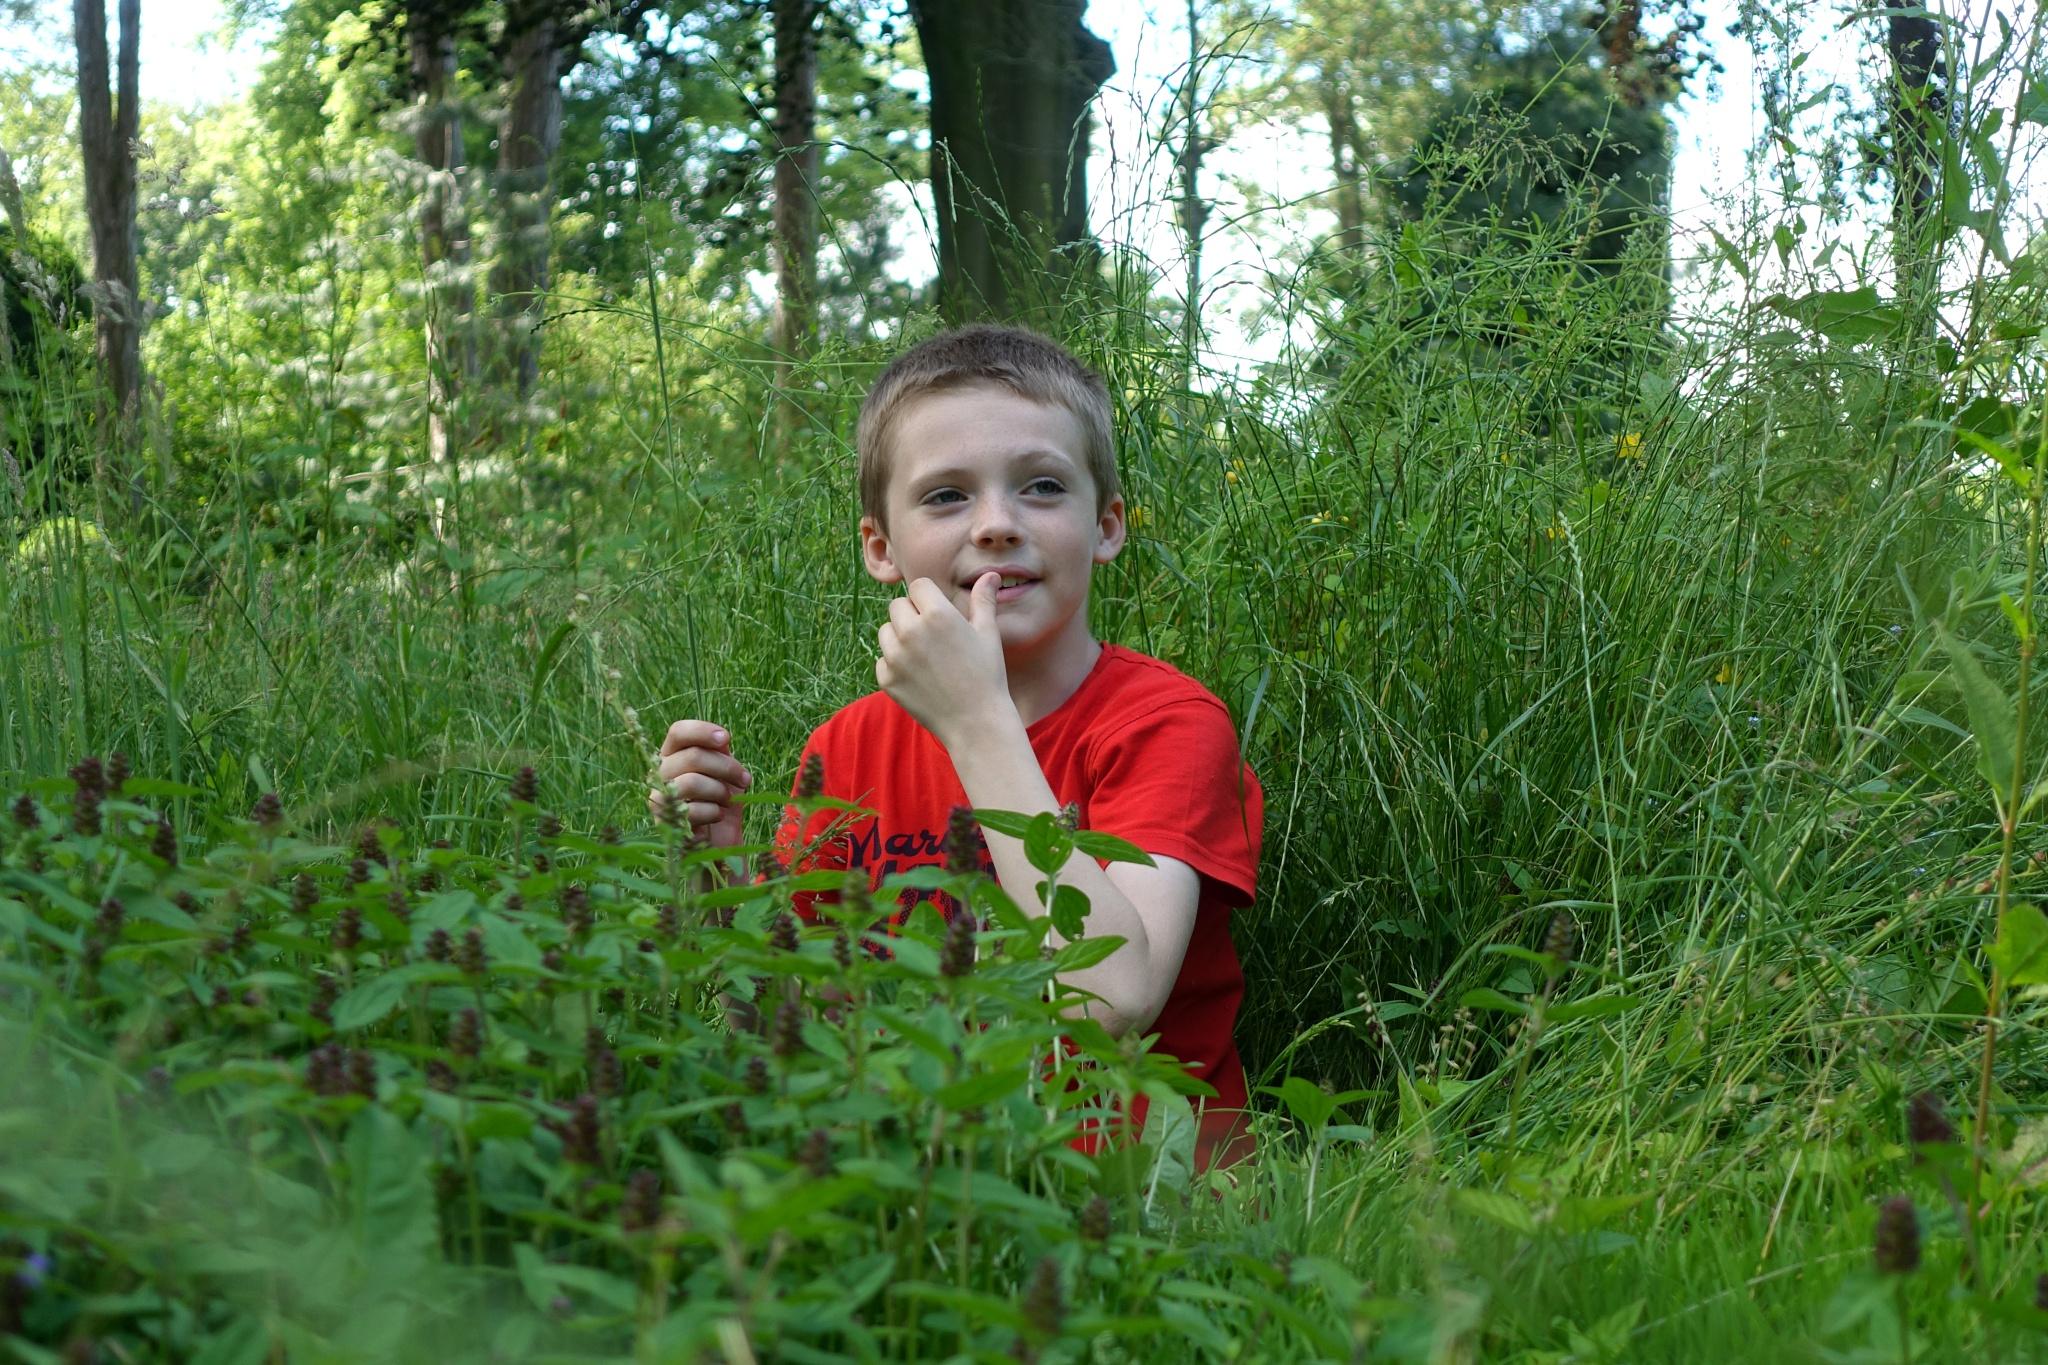 Boy in the Meadow Grass by kayThornton